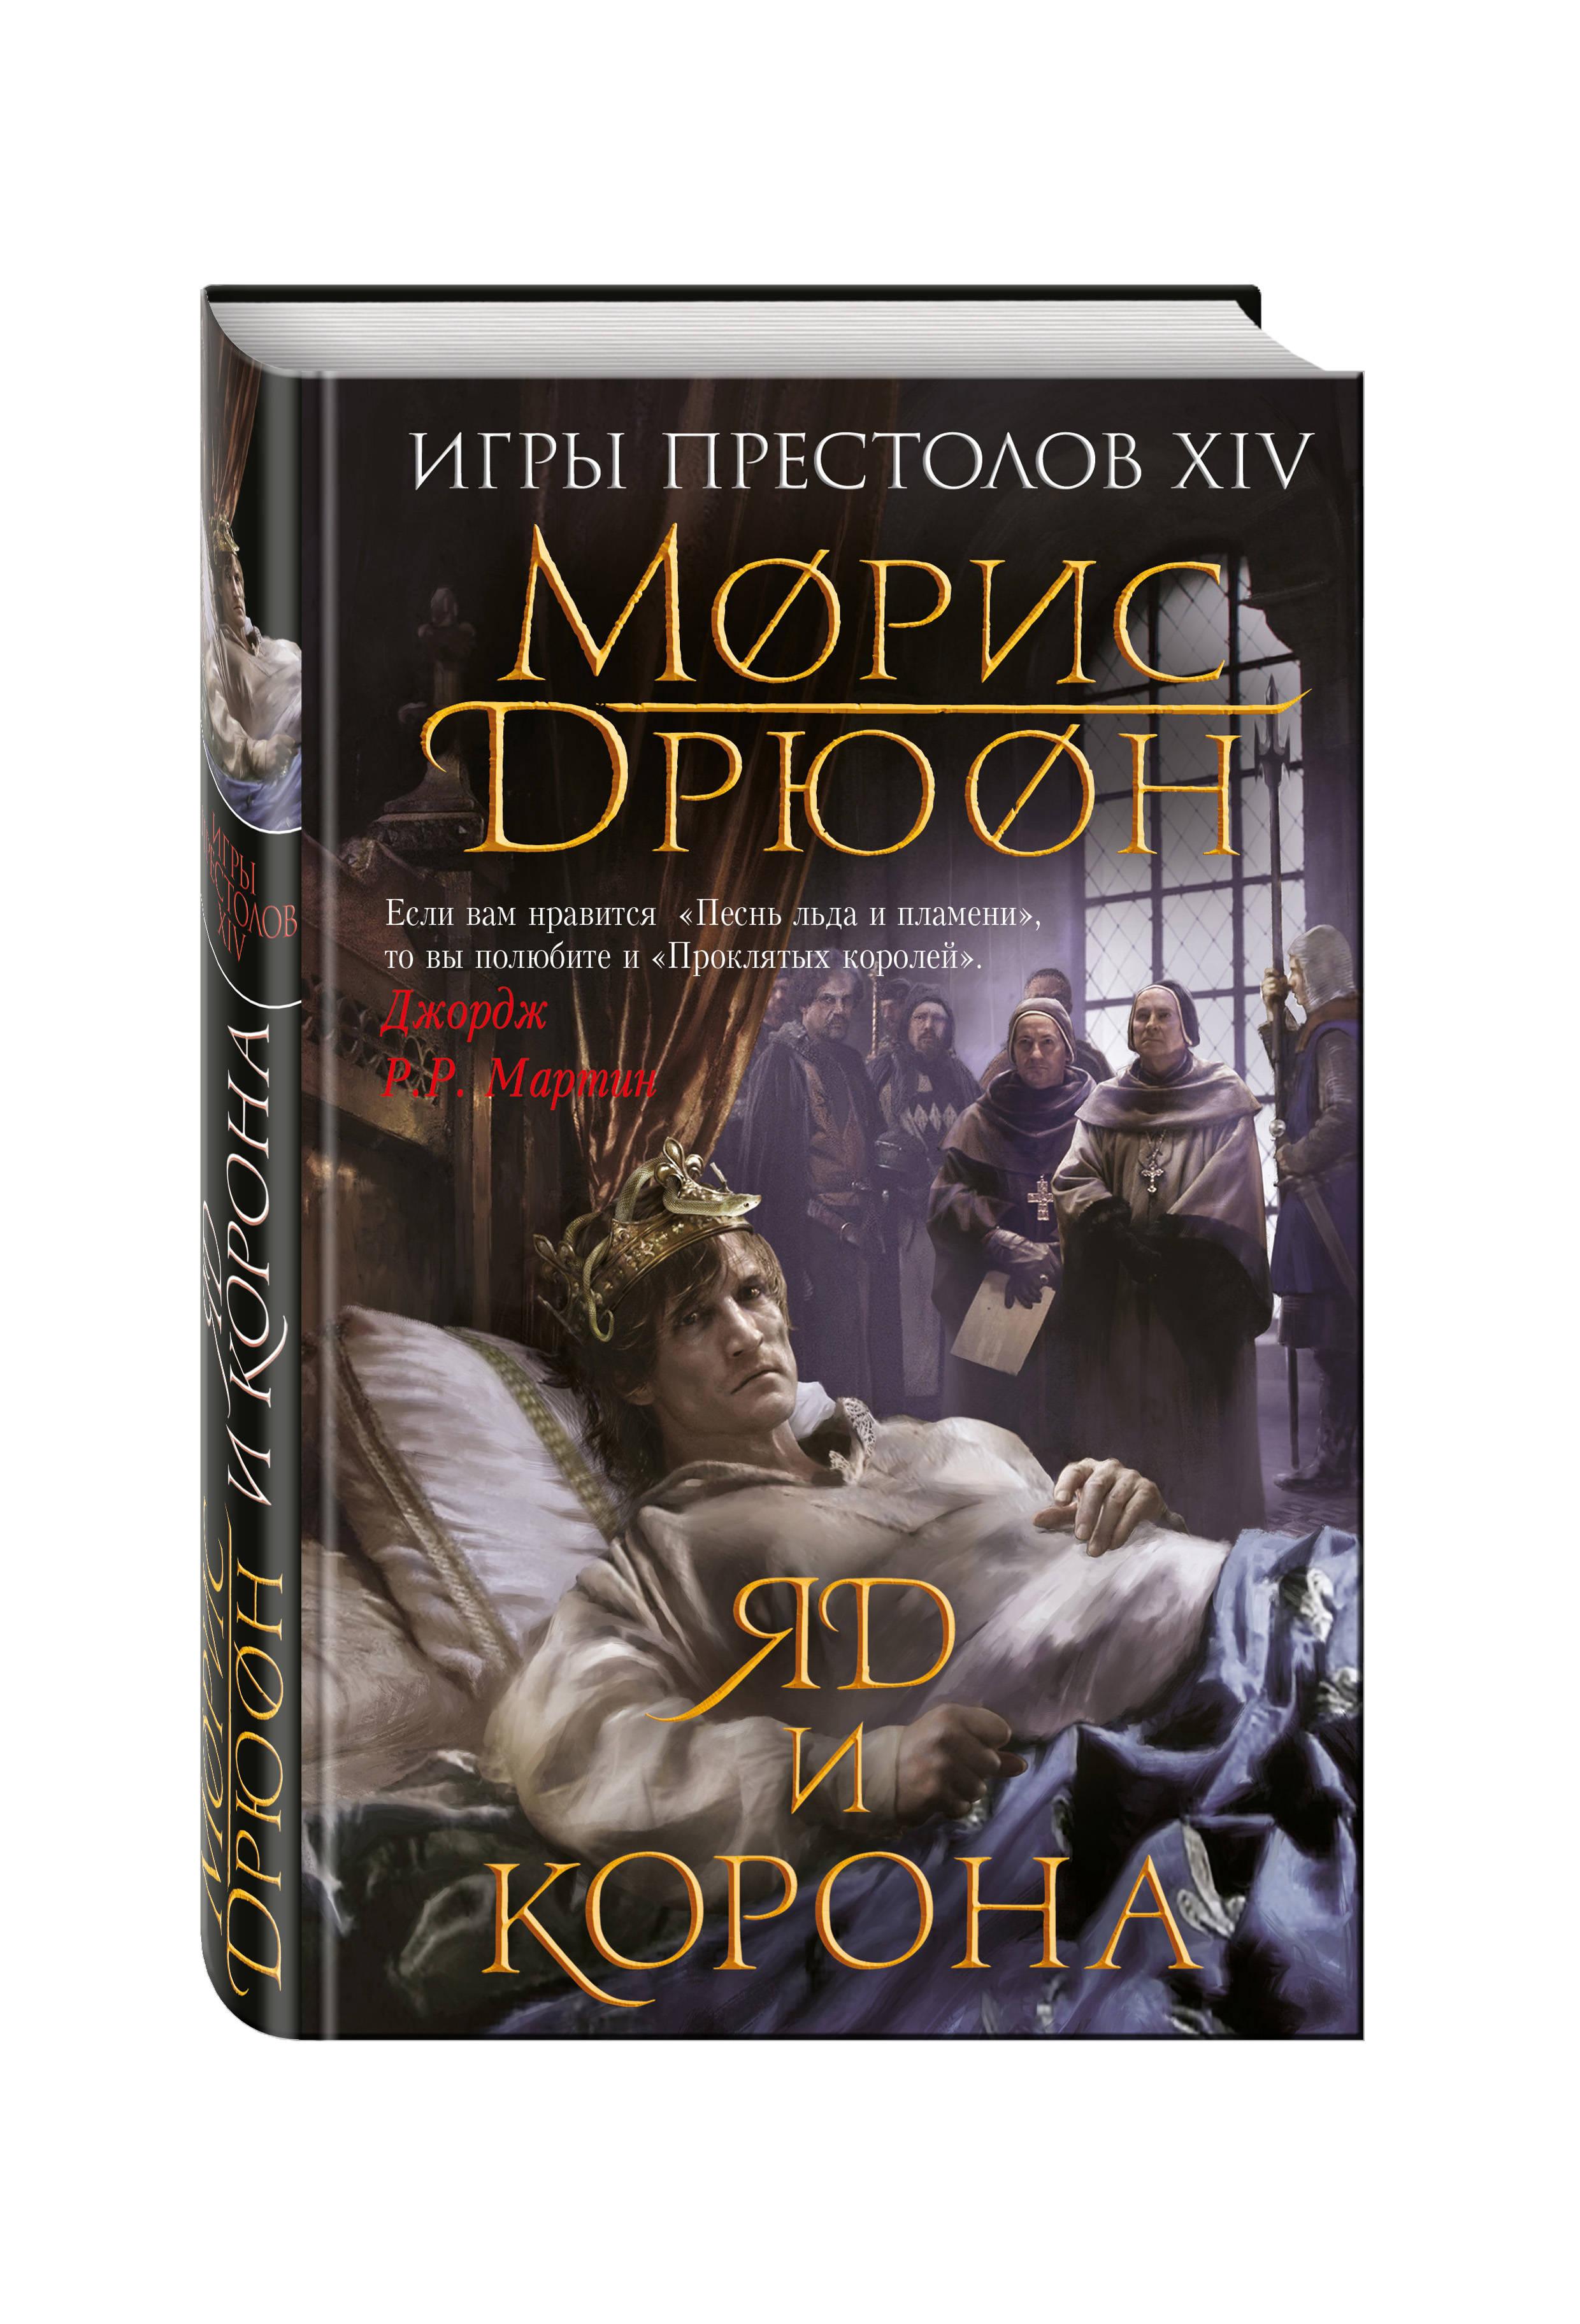 Яд и корона от book24.ru